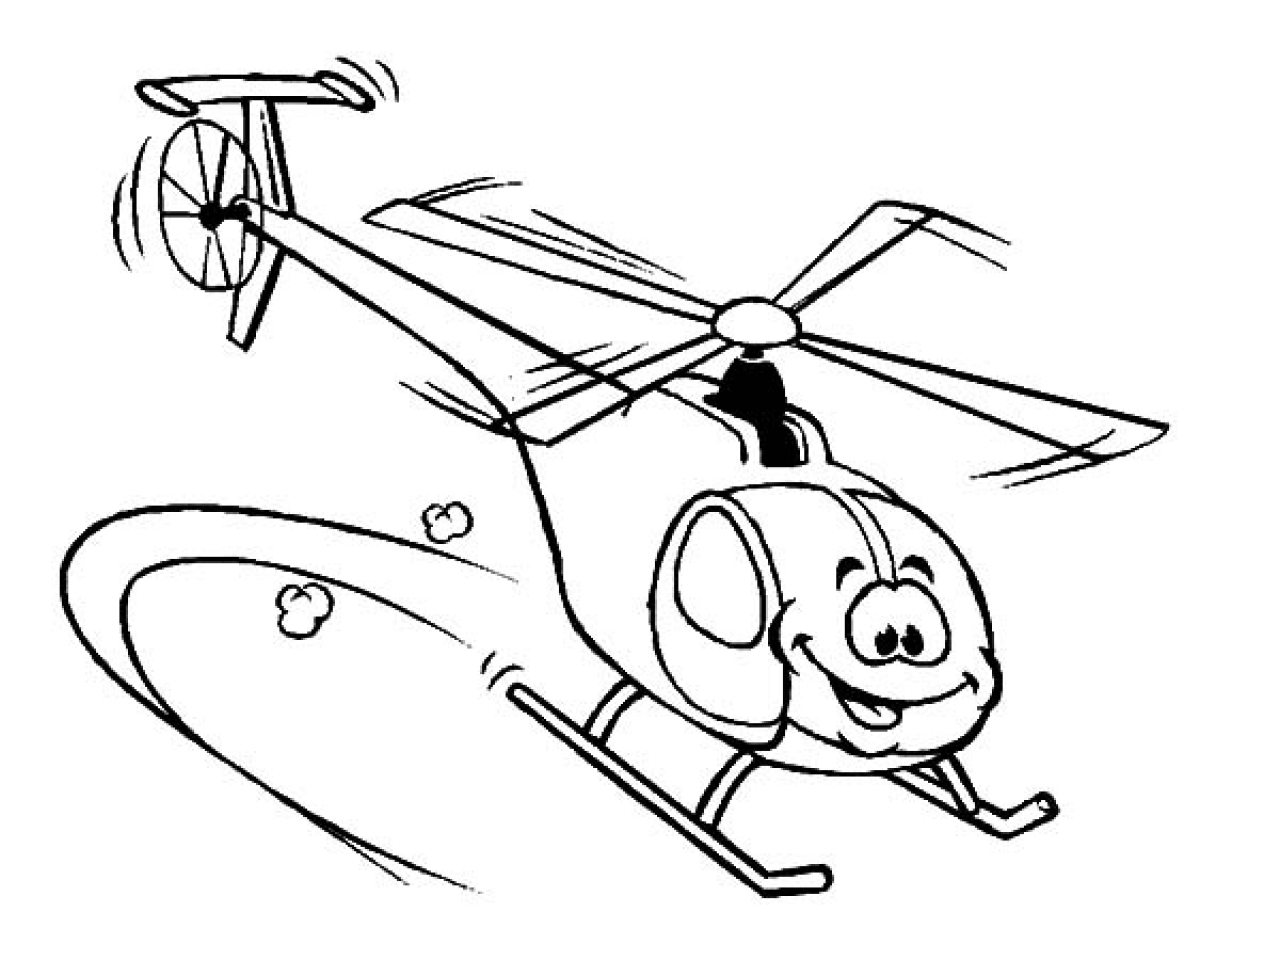 Blackhawk Drawing At Getdrawings